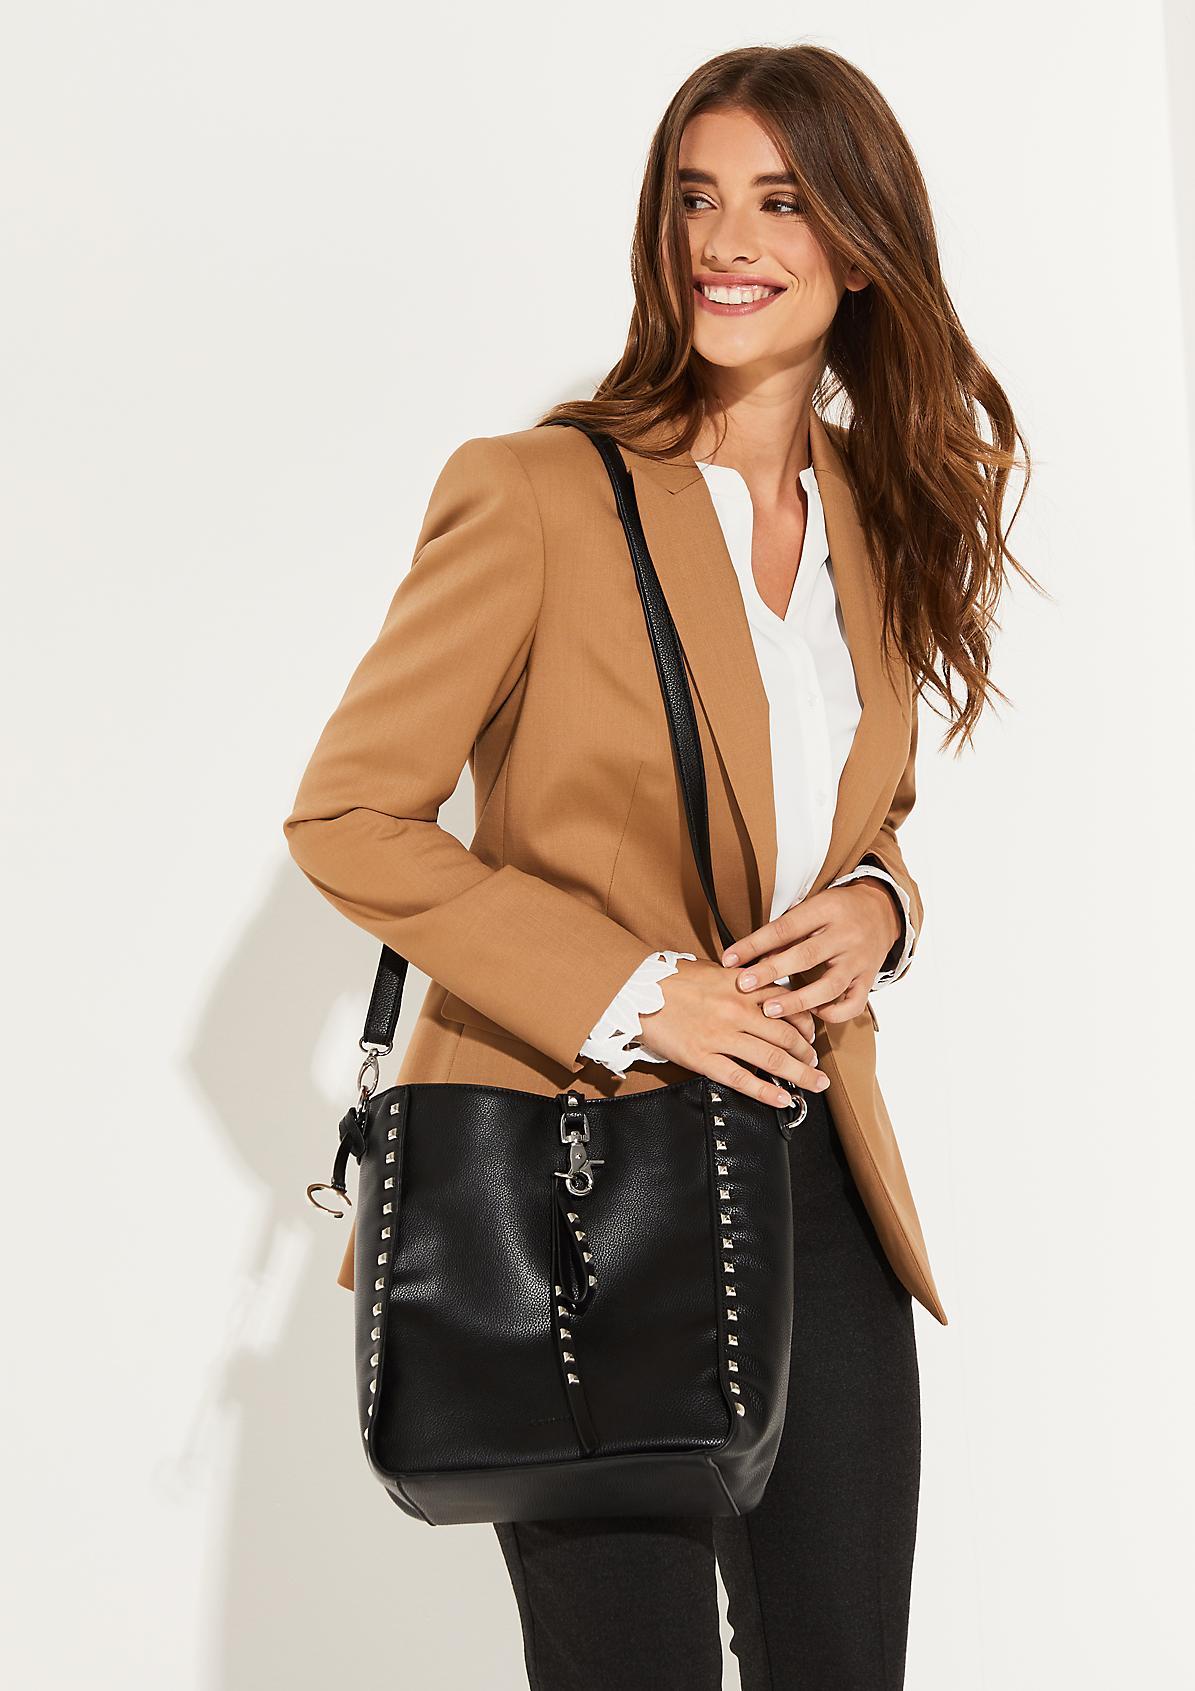 Shoppingbag mit Nietenverzierung